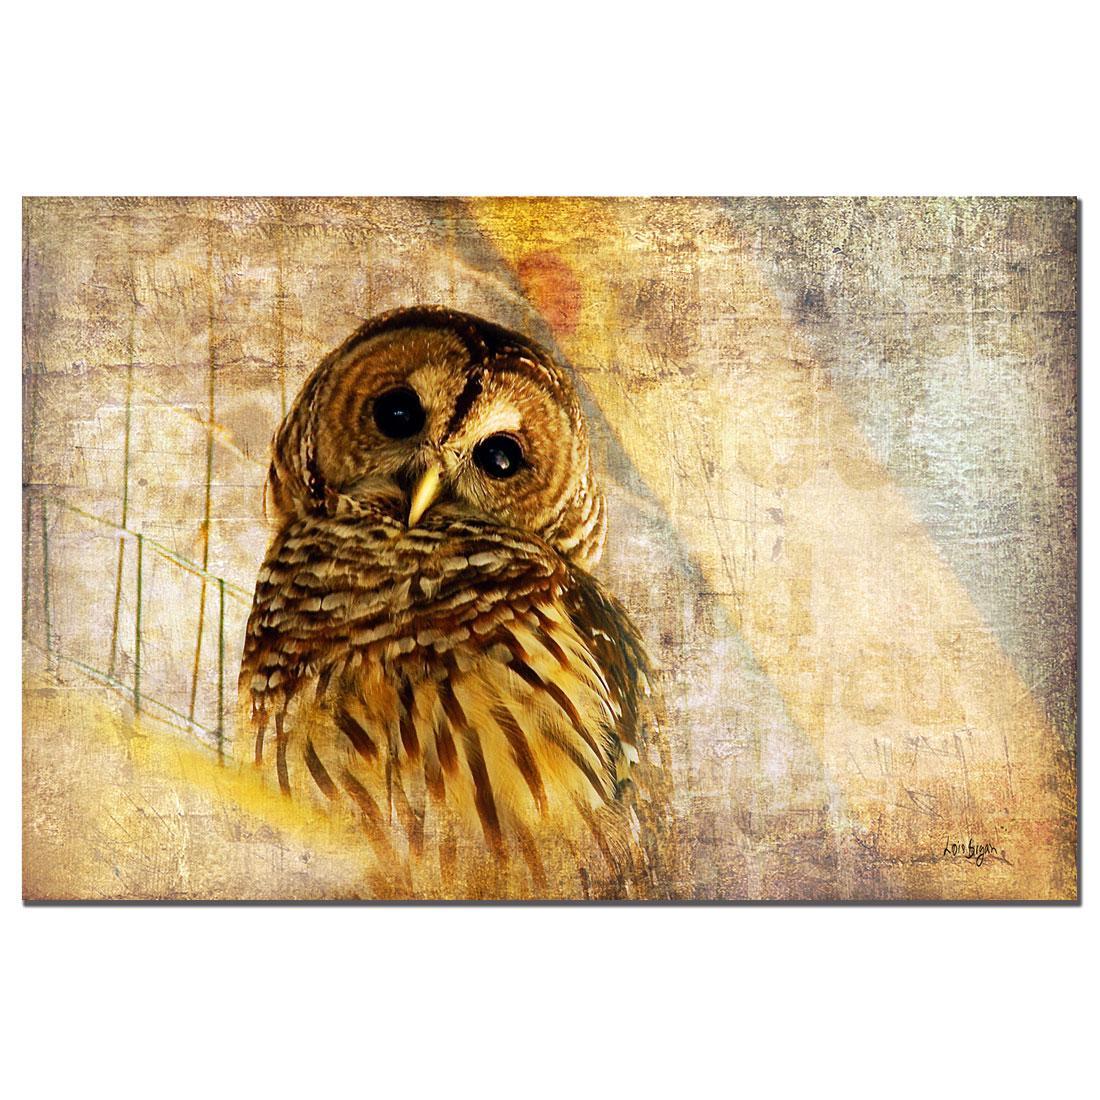 Lois Bryan 'Owl' Canvas Art